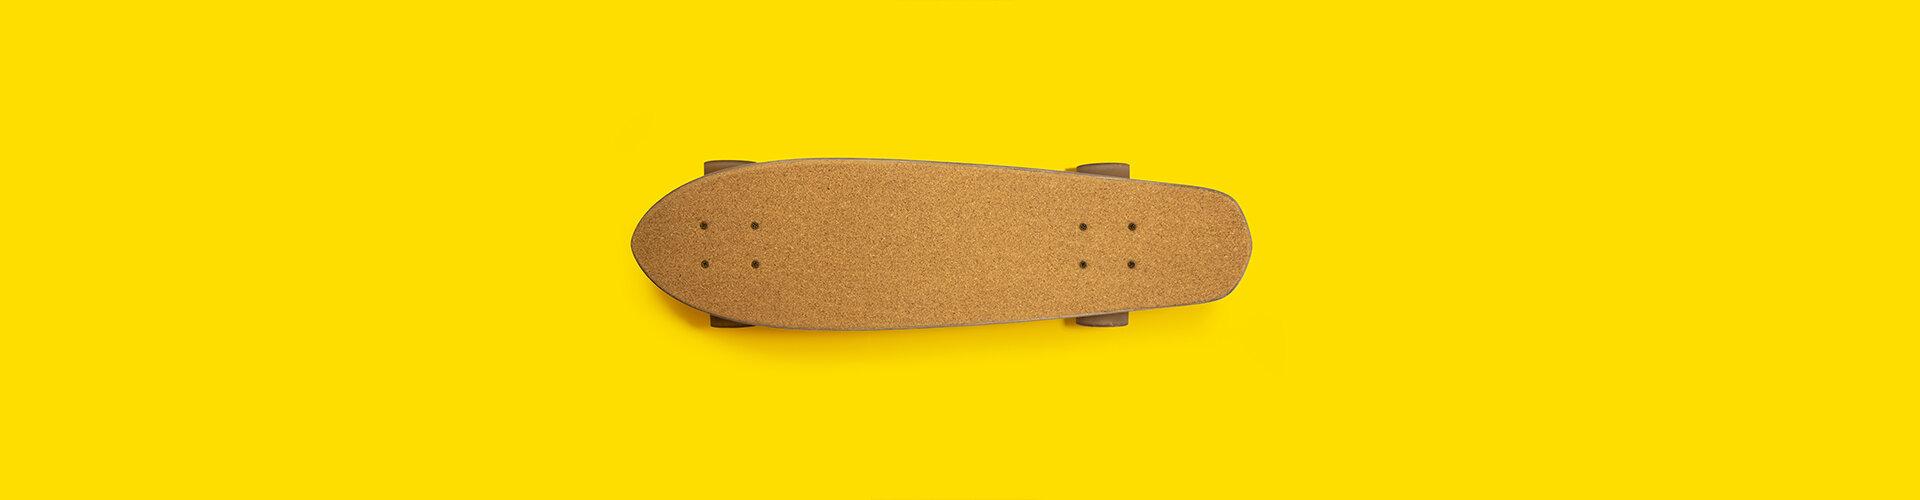 Pimp Grip Single Sheet School Bus Yellow Skateboarding Griptape